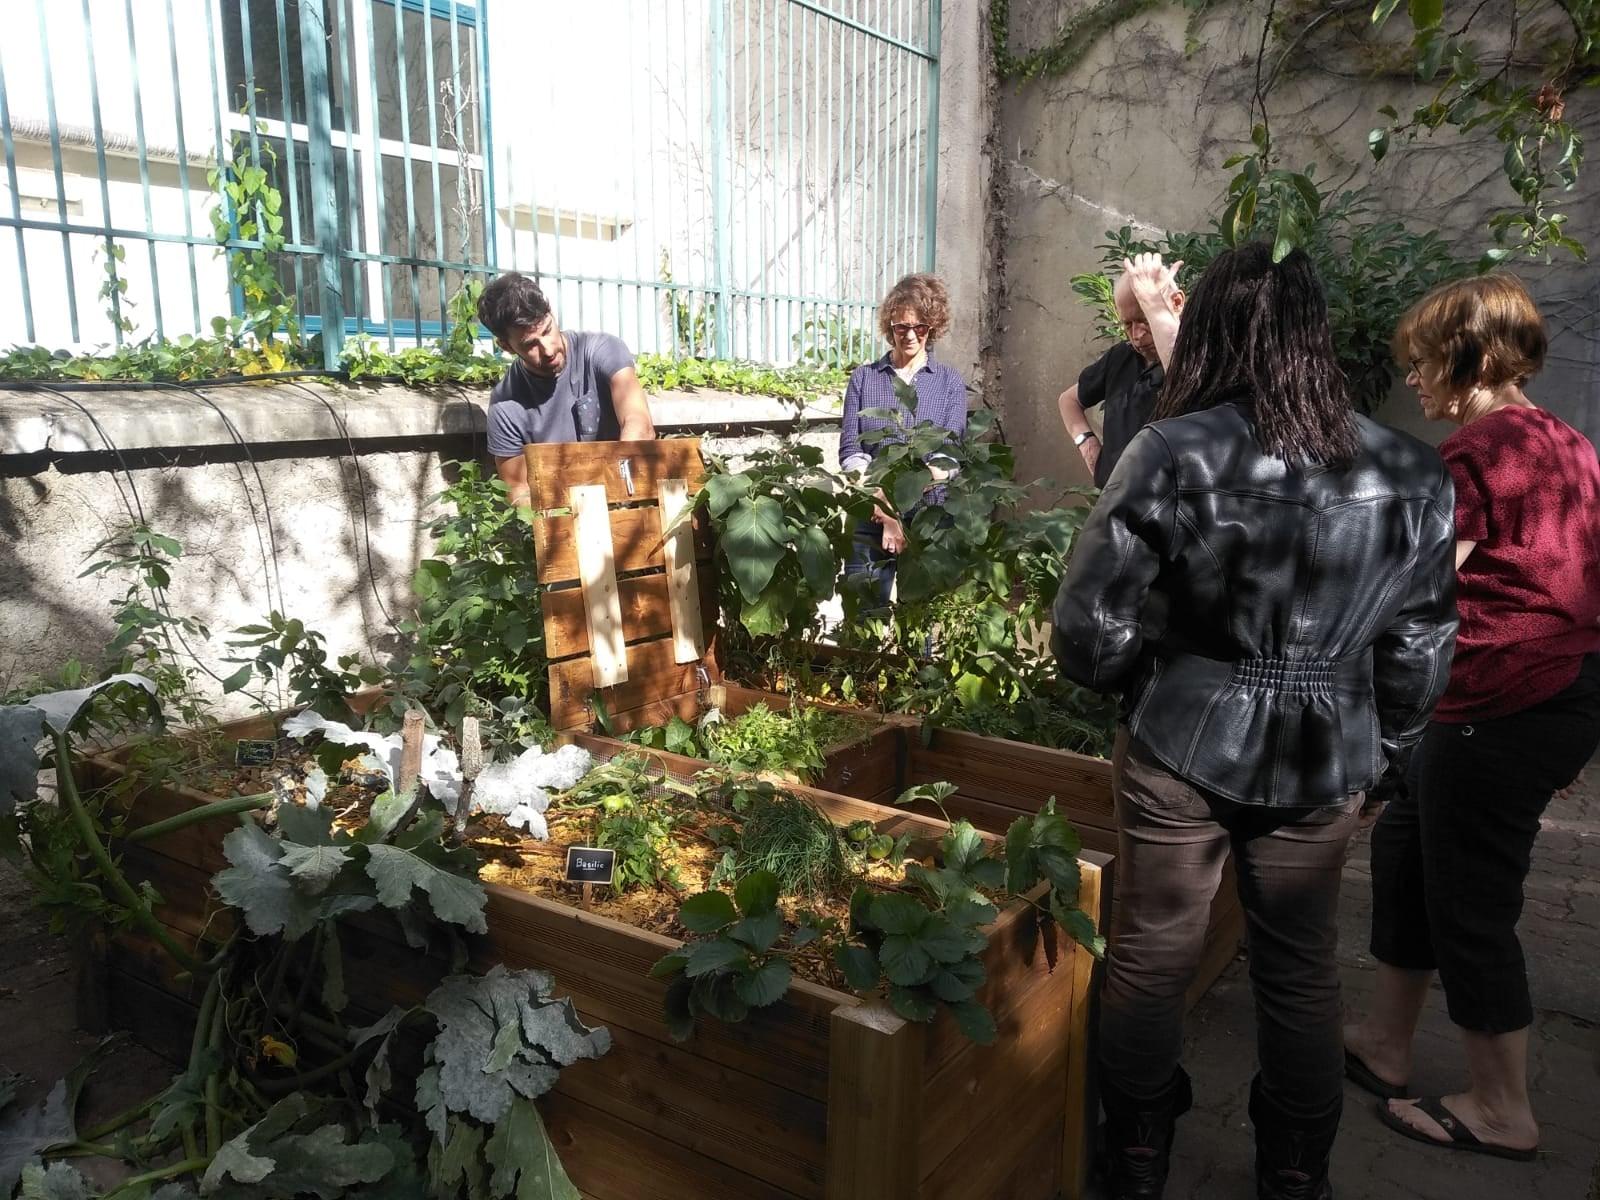 Merci Raymond - Végétalisation en milieux urbains